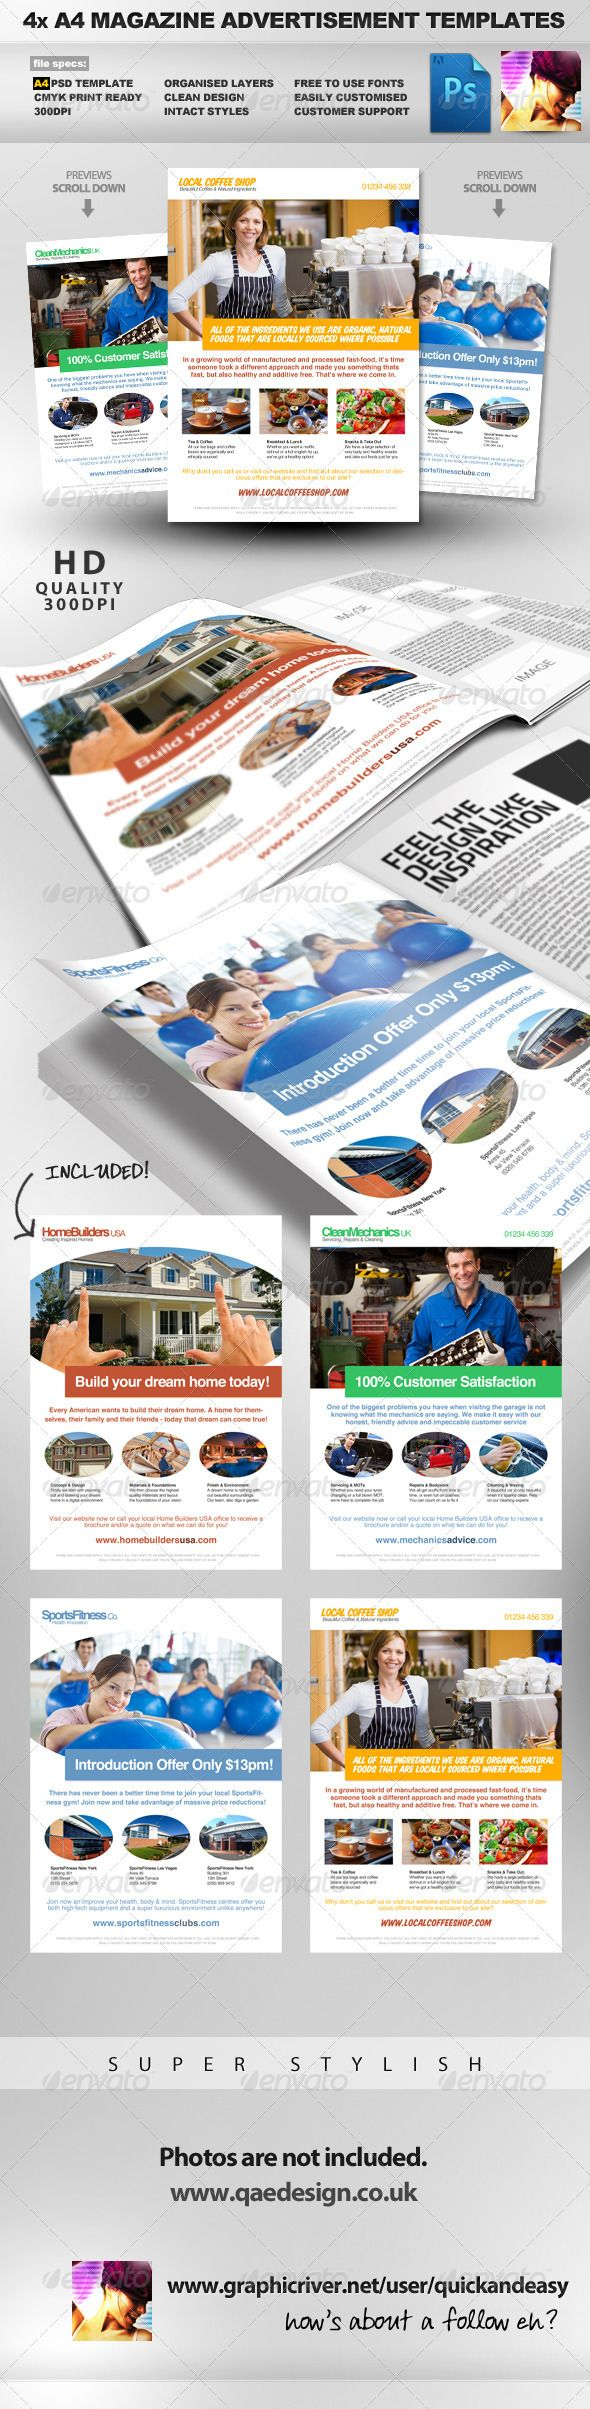 4x Clean Magazine Advertisement Templates by quickandeasy 4xCLEAN , CRISPAND HIGHLY EDITABLE A4 PSD MAGAZINE AD TEMPLATES A clean, crisp, highly editable A4 multiusePSDMagazine Ad Templ